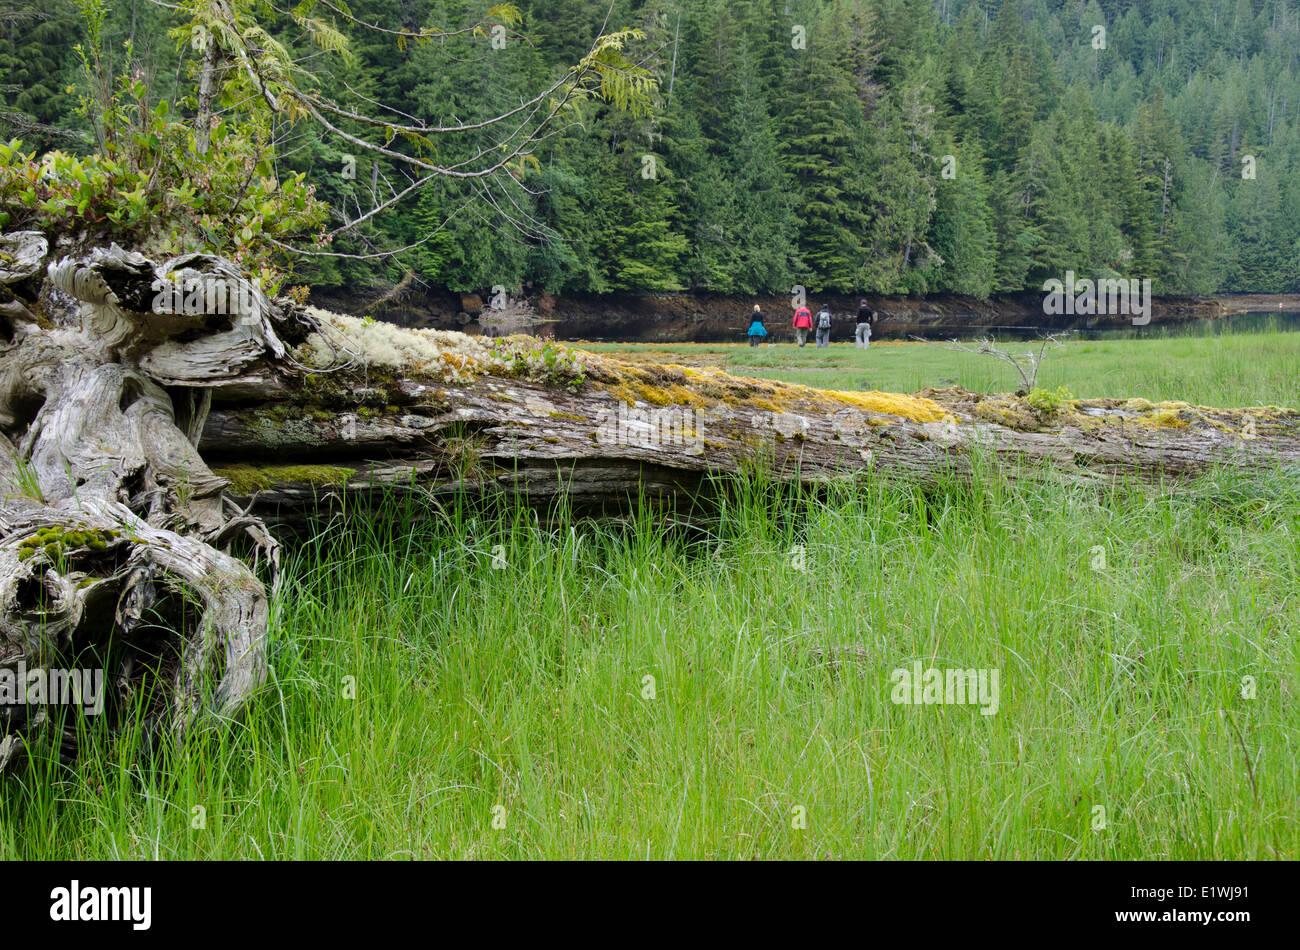 Guests wander shoreline at Nimmo Bay Wilderness Resort, British Columbia, Canada - Stock Image